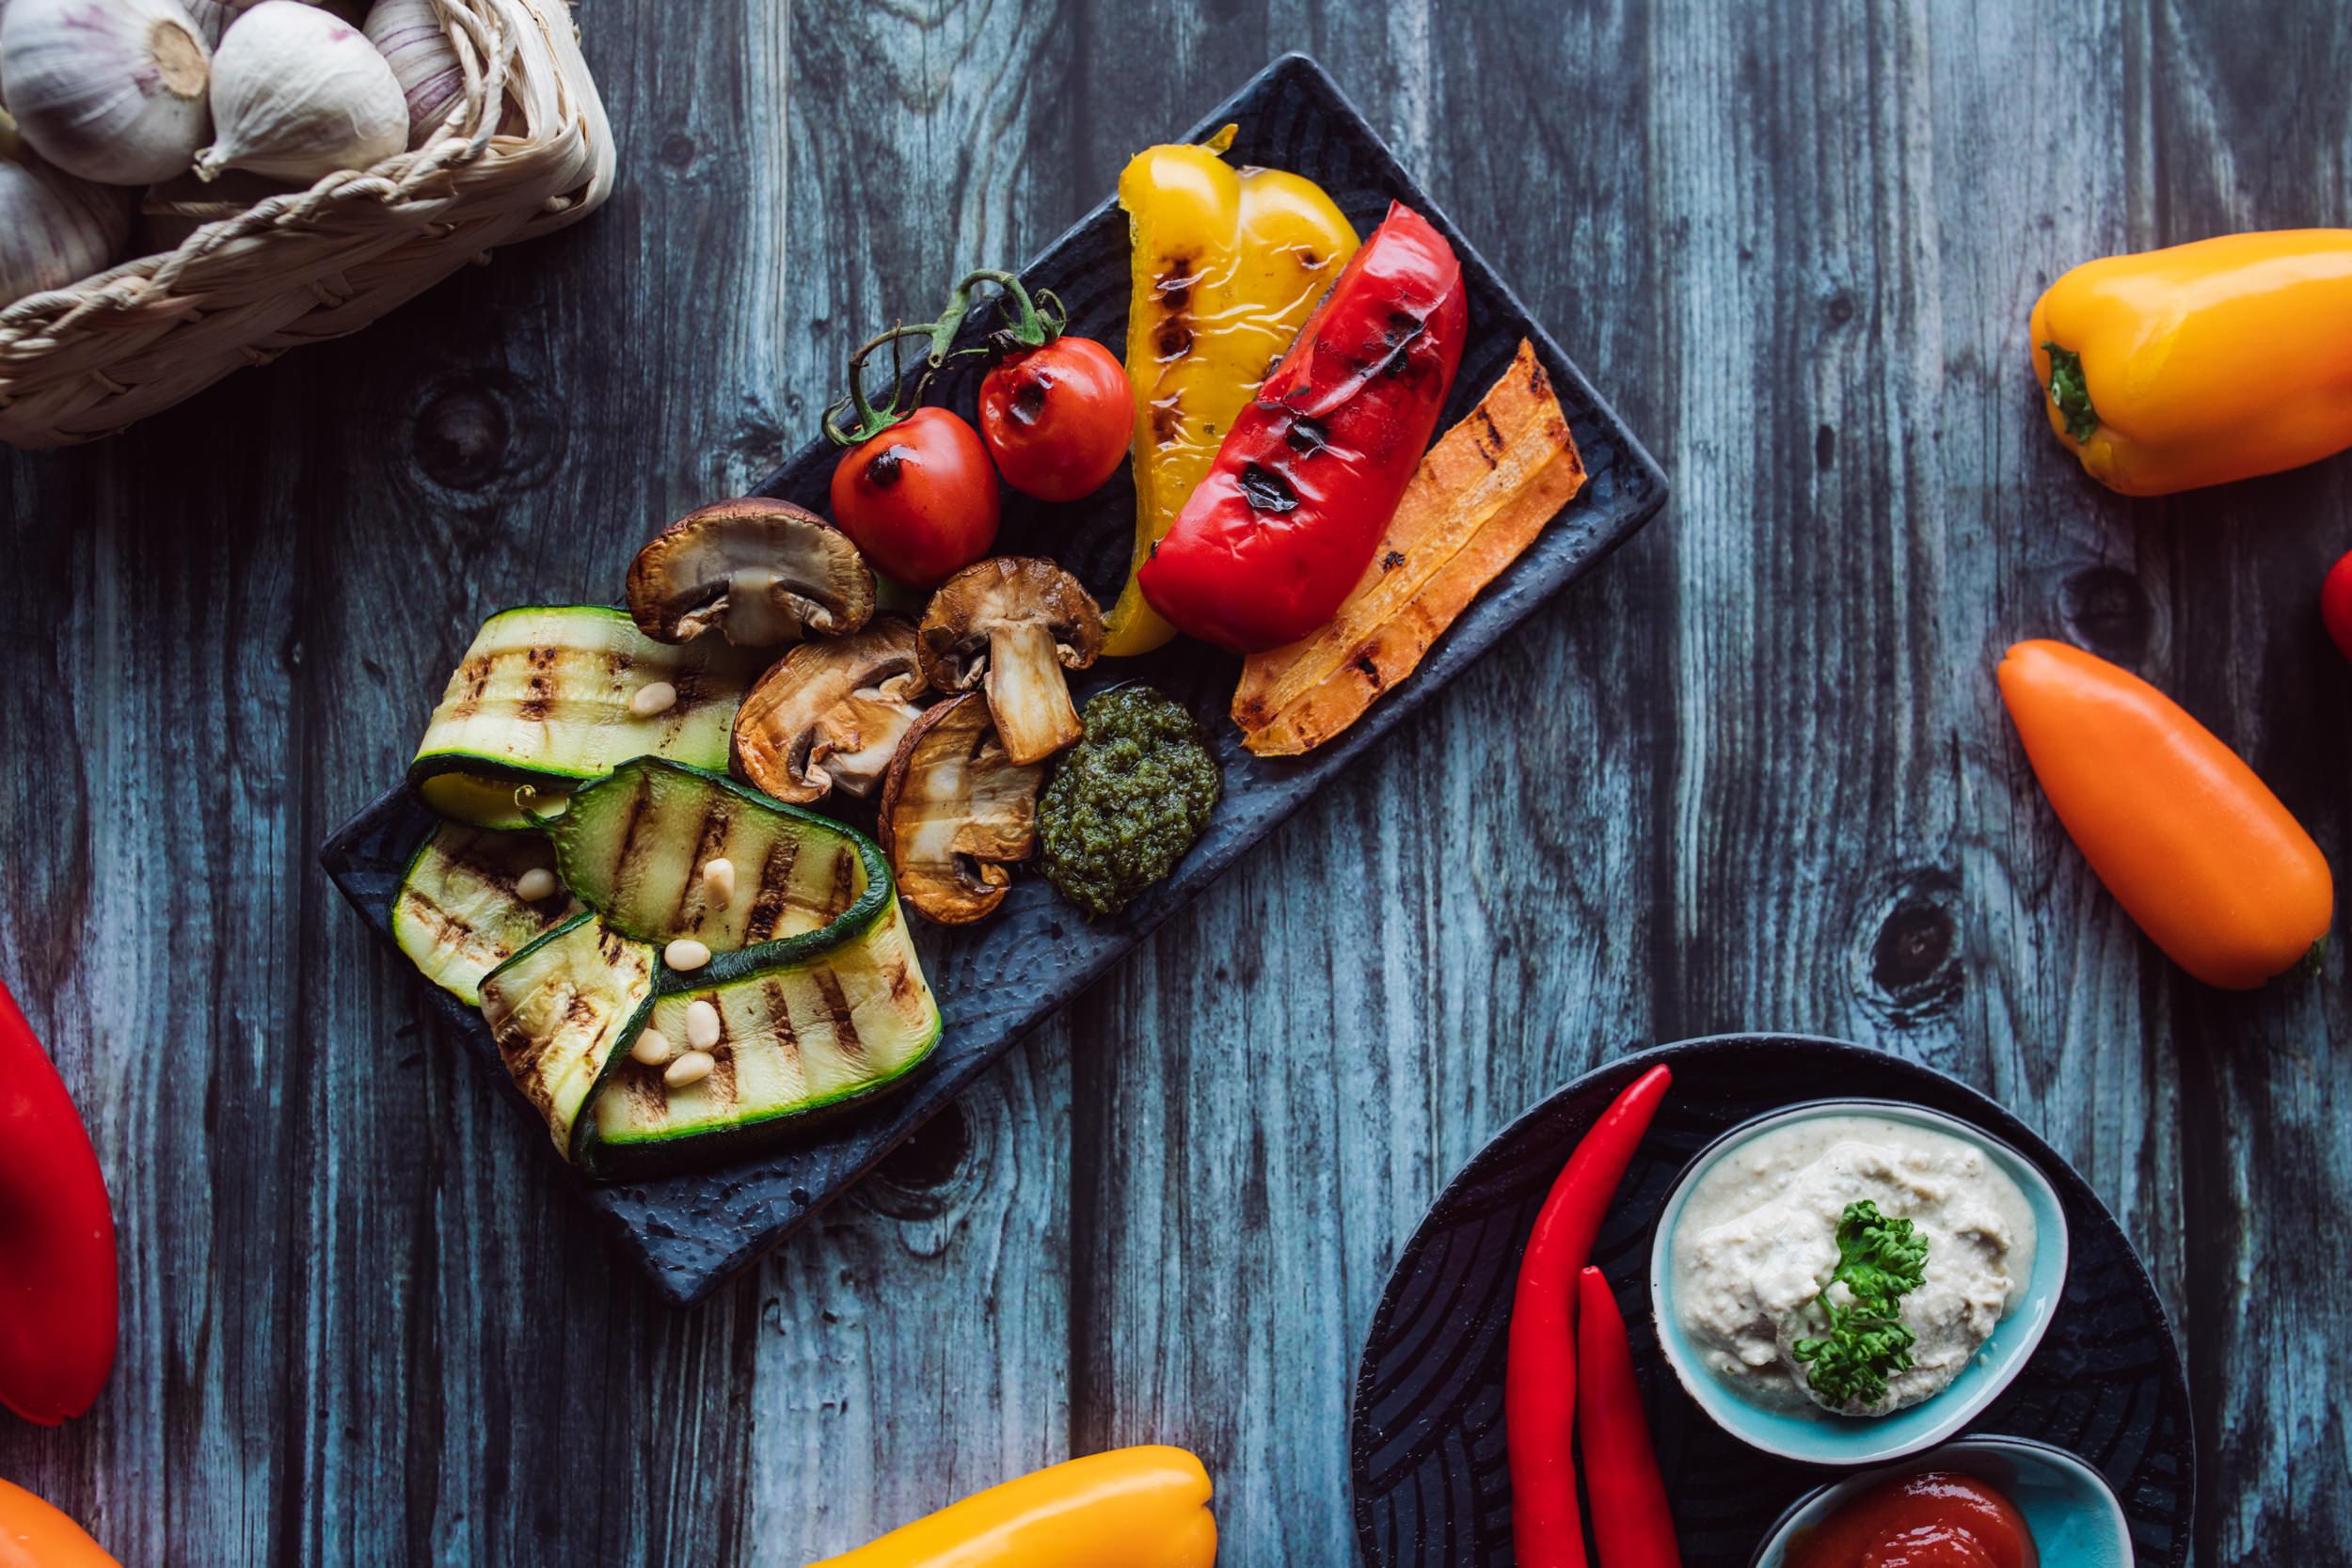 FOOD STUDIO PATRICKSCHMETZER ESSEN 7  Food